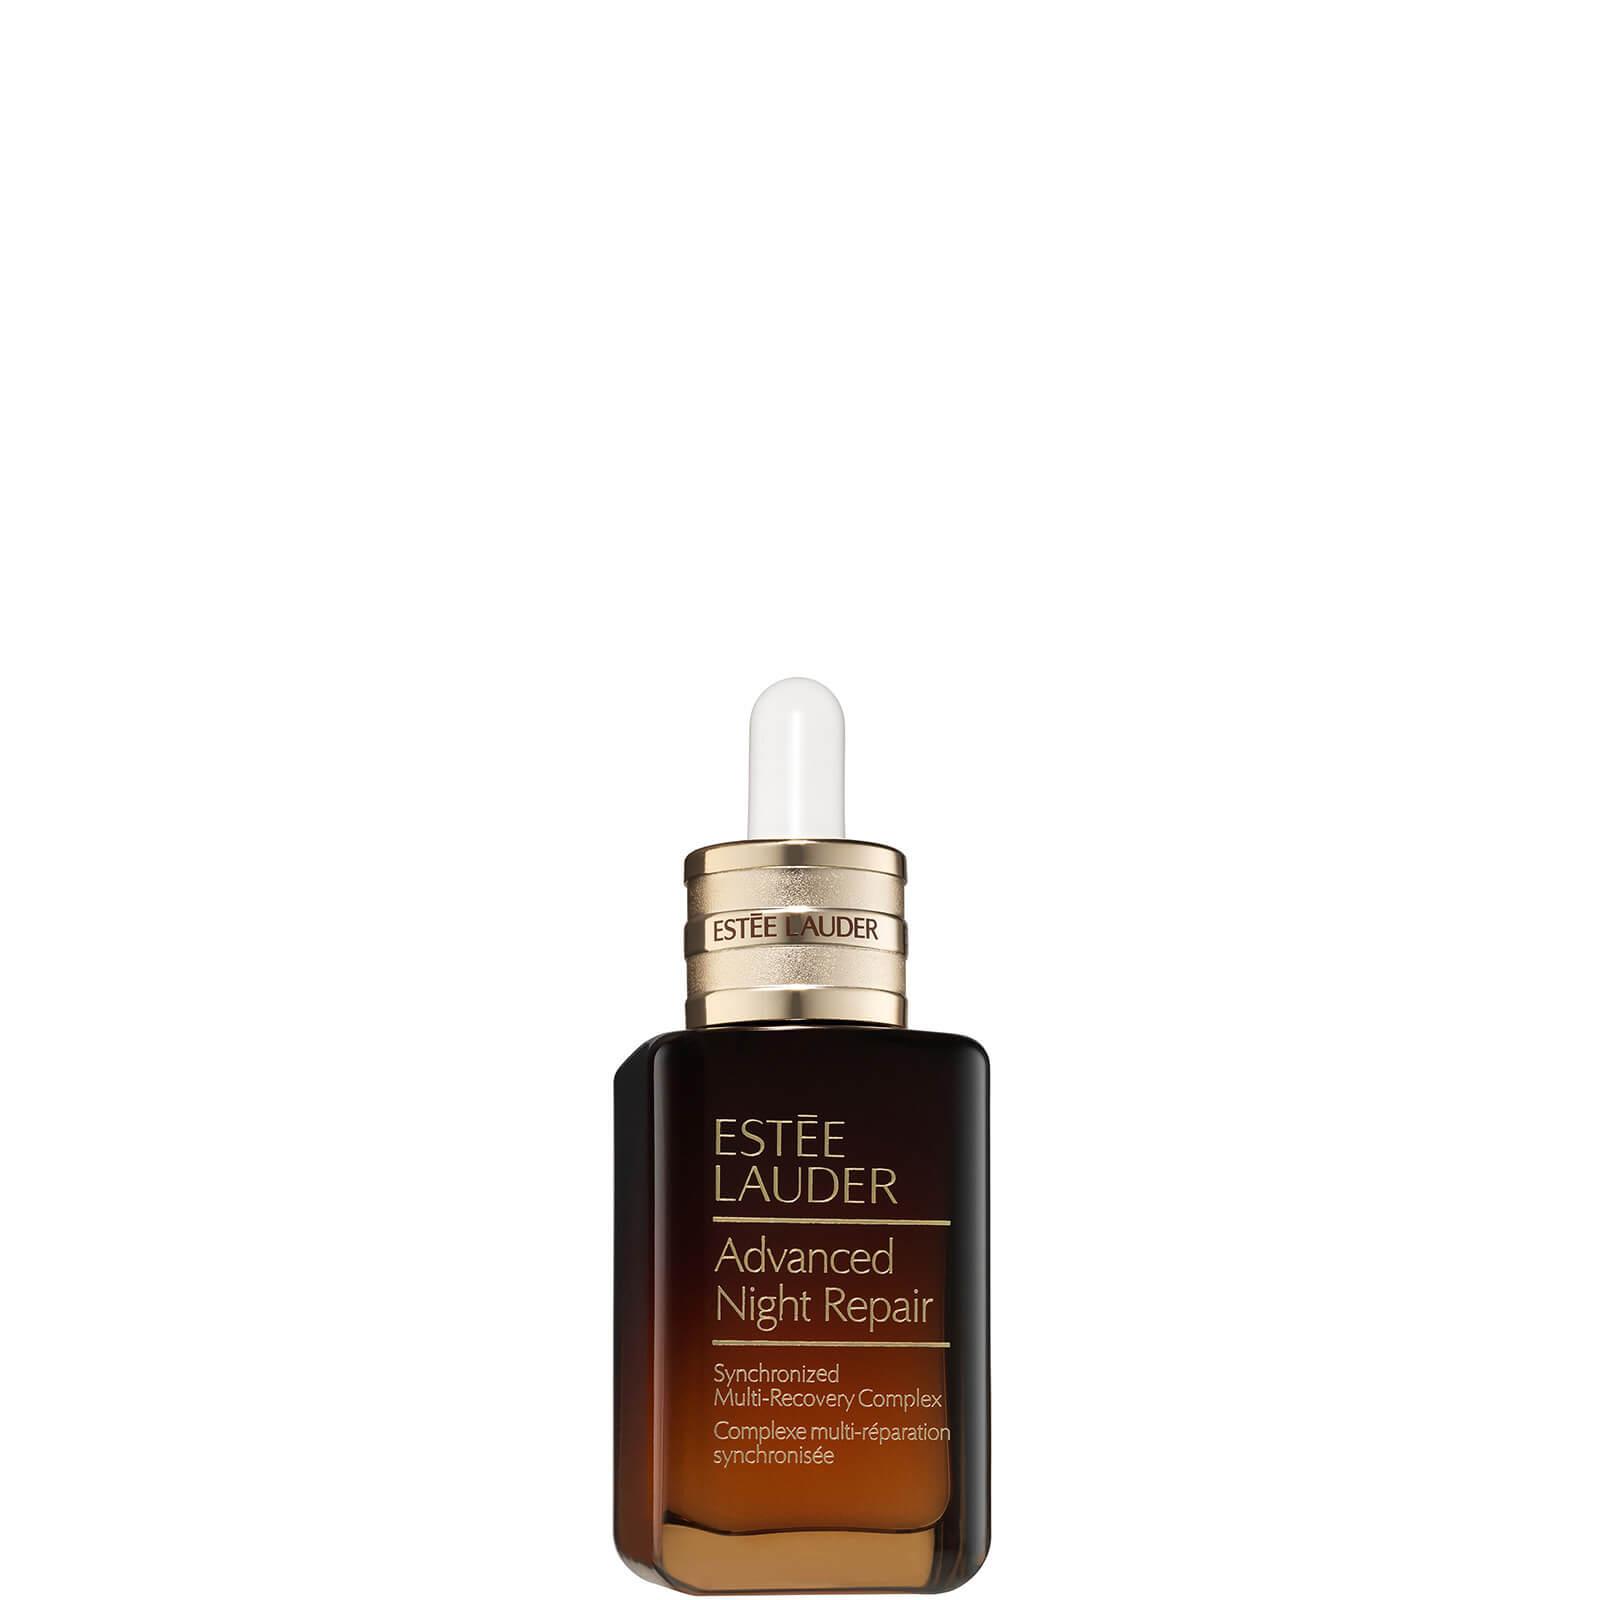 Купить Estée Lauder Advanced Night Repair Synchronized Multi-Recovery Complex Serum (Various Sizes) - 75ml